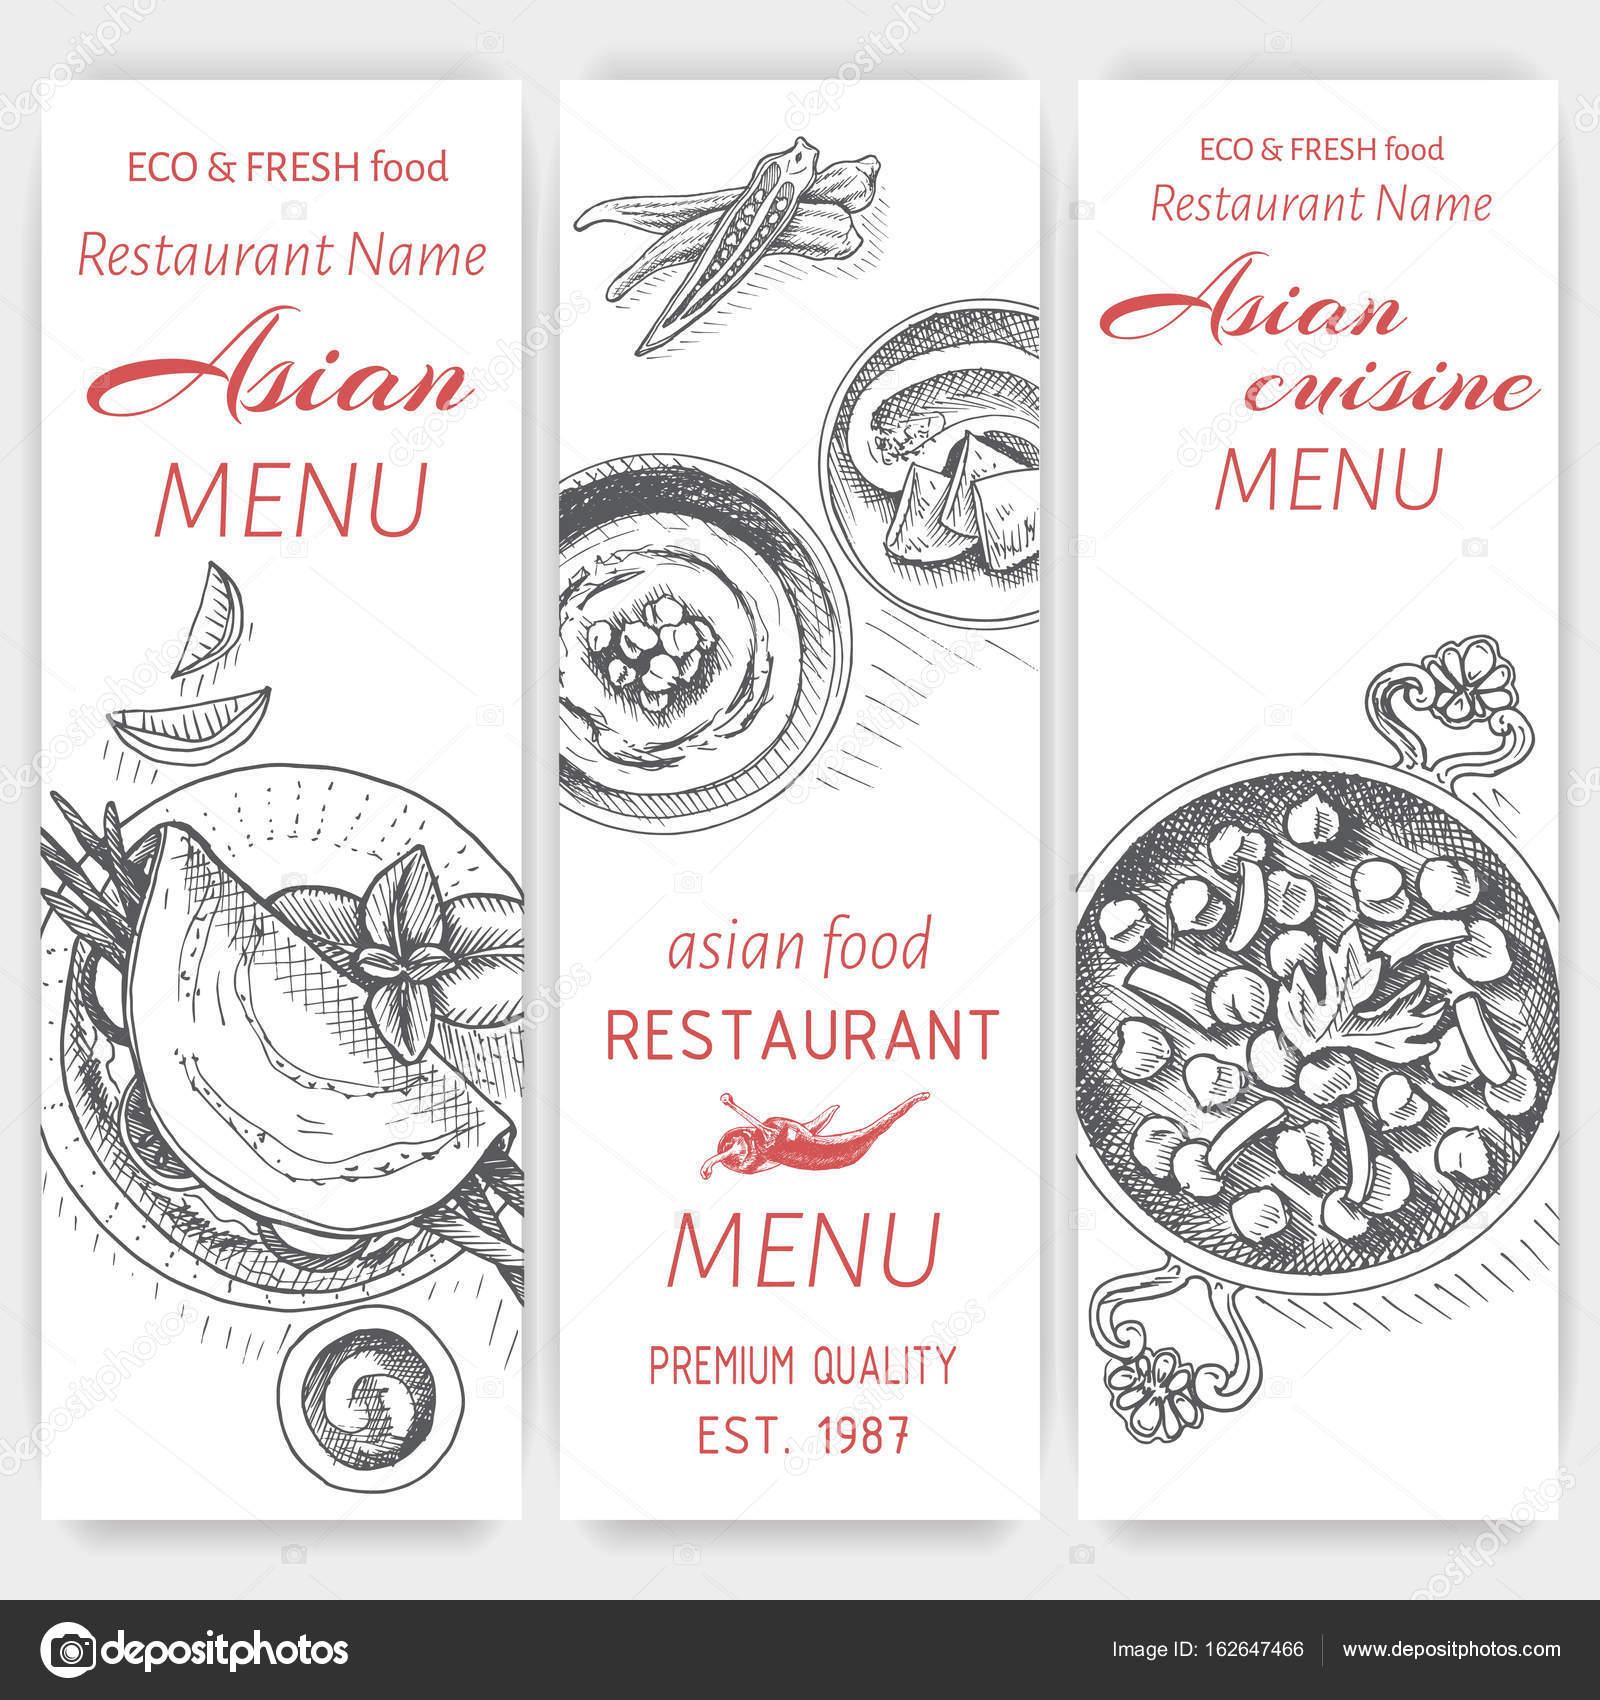 plantilla de diseño de menú de comida asiática — Vector de stock ...